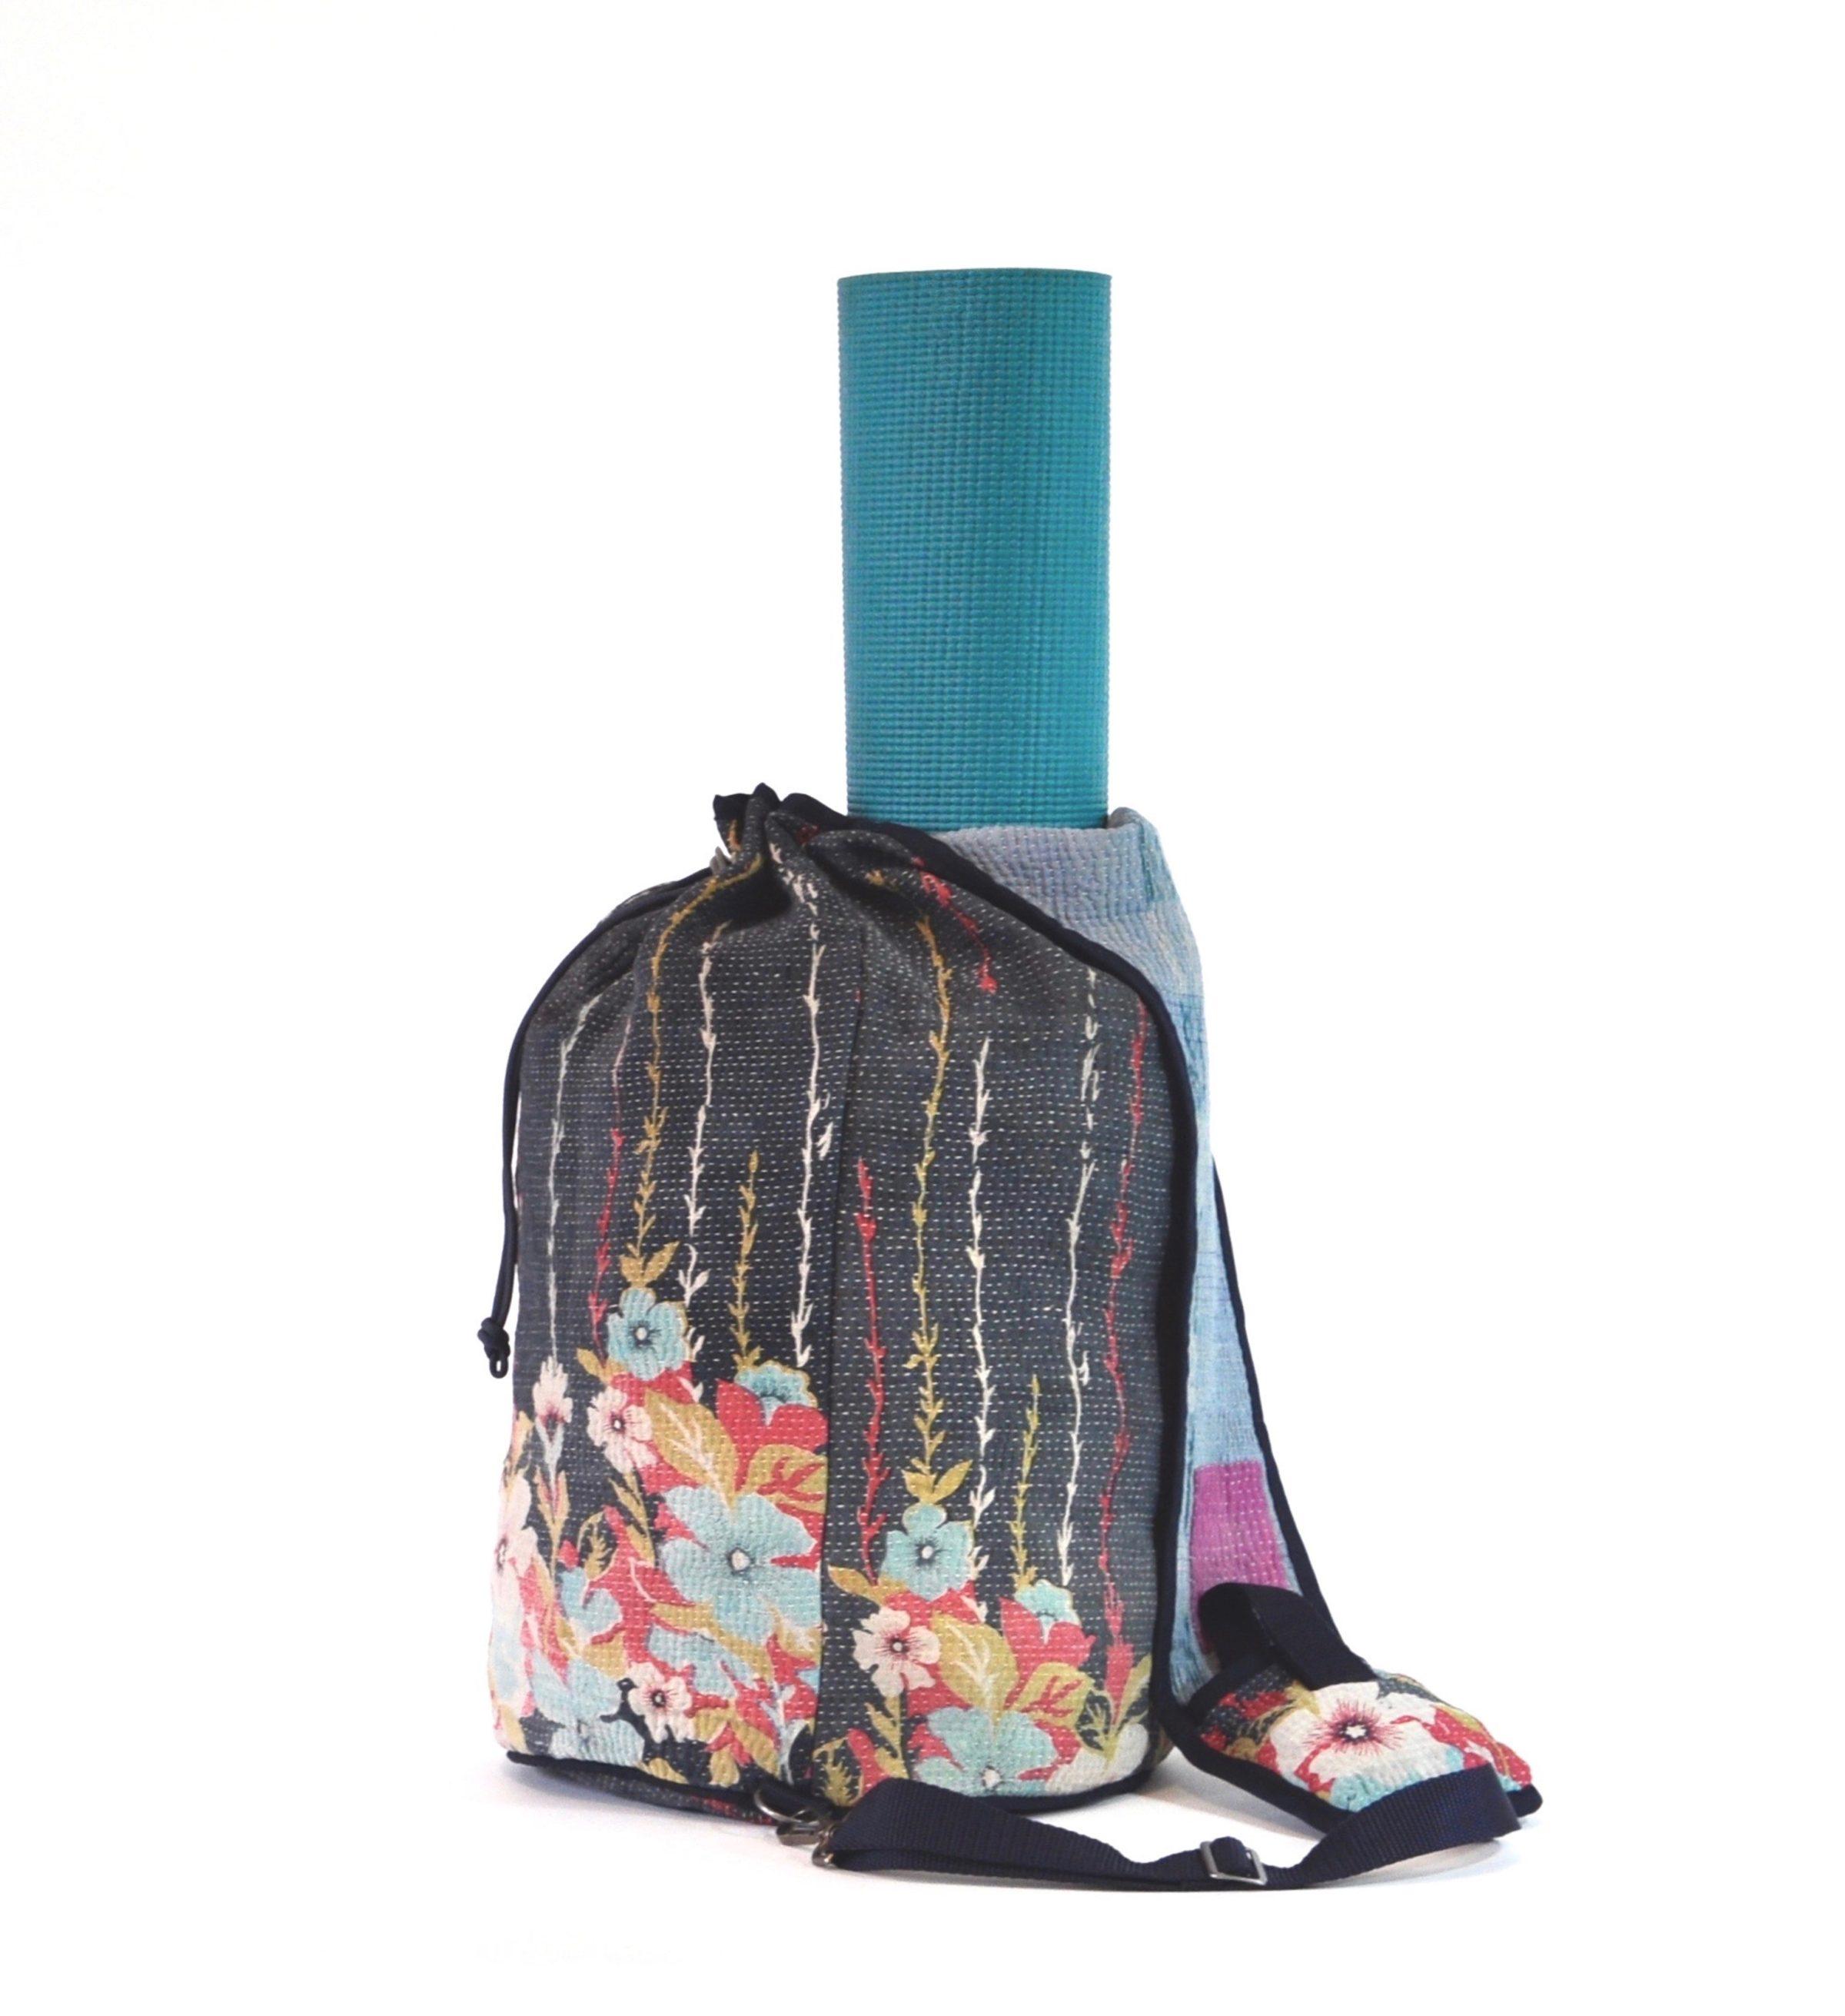 Grey-Blue Floral W/ Vertical Vines Crossbody Bag | Yesness